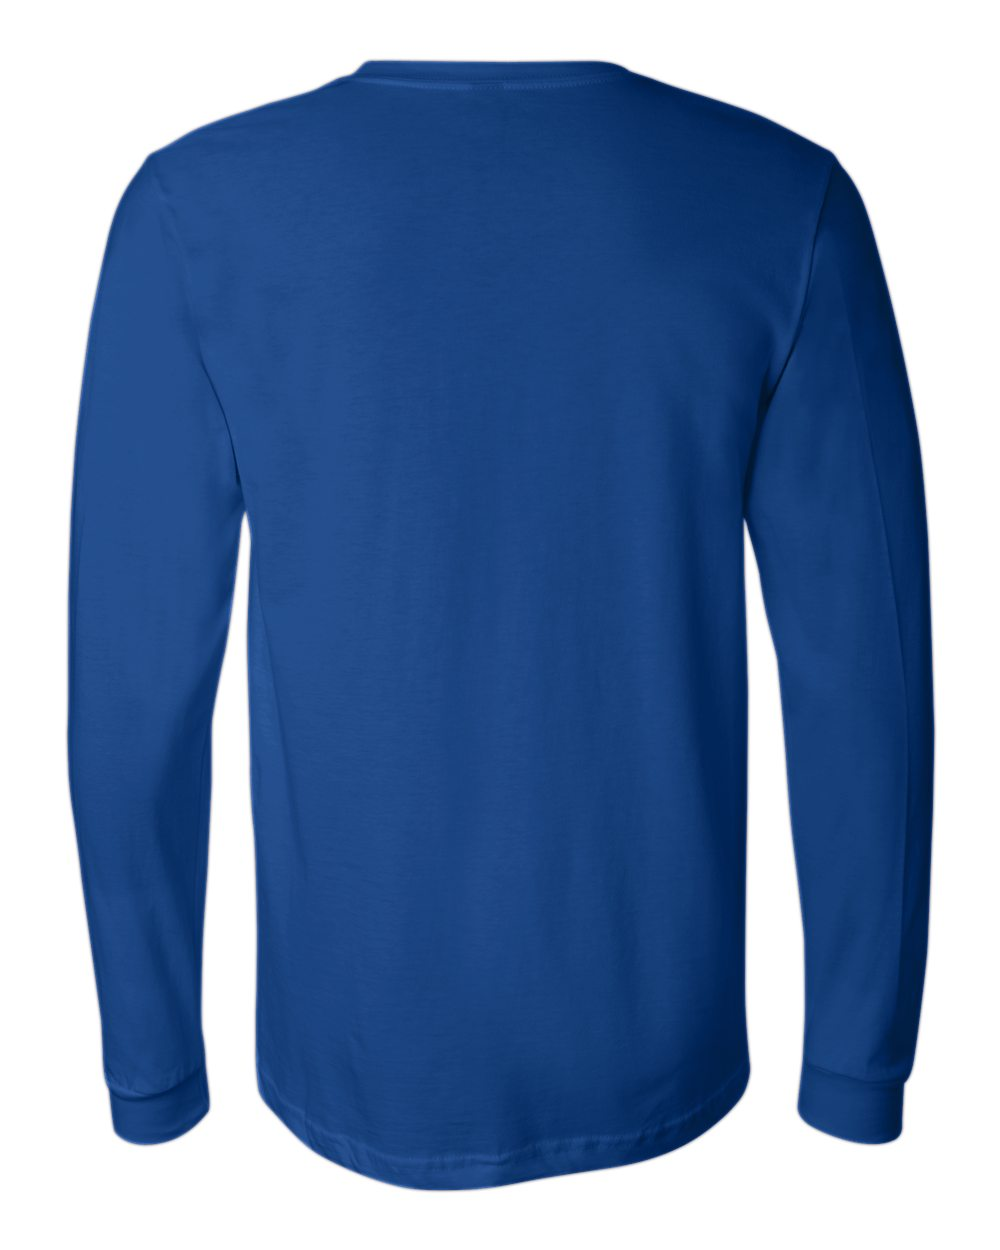 Bella-Canvas-Mens-Blank-Top-Long-Sleeve-Jersey-Tee-T-Shirt-3501-up-to-3XL thumbnail 111